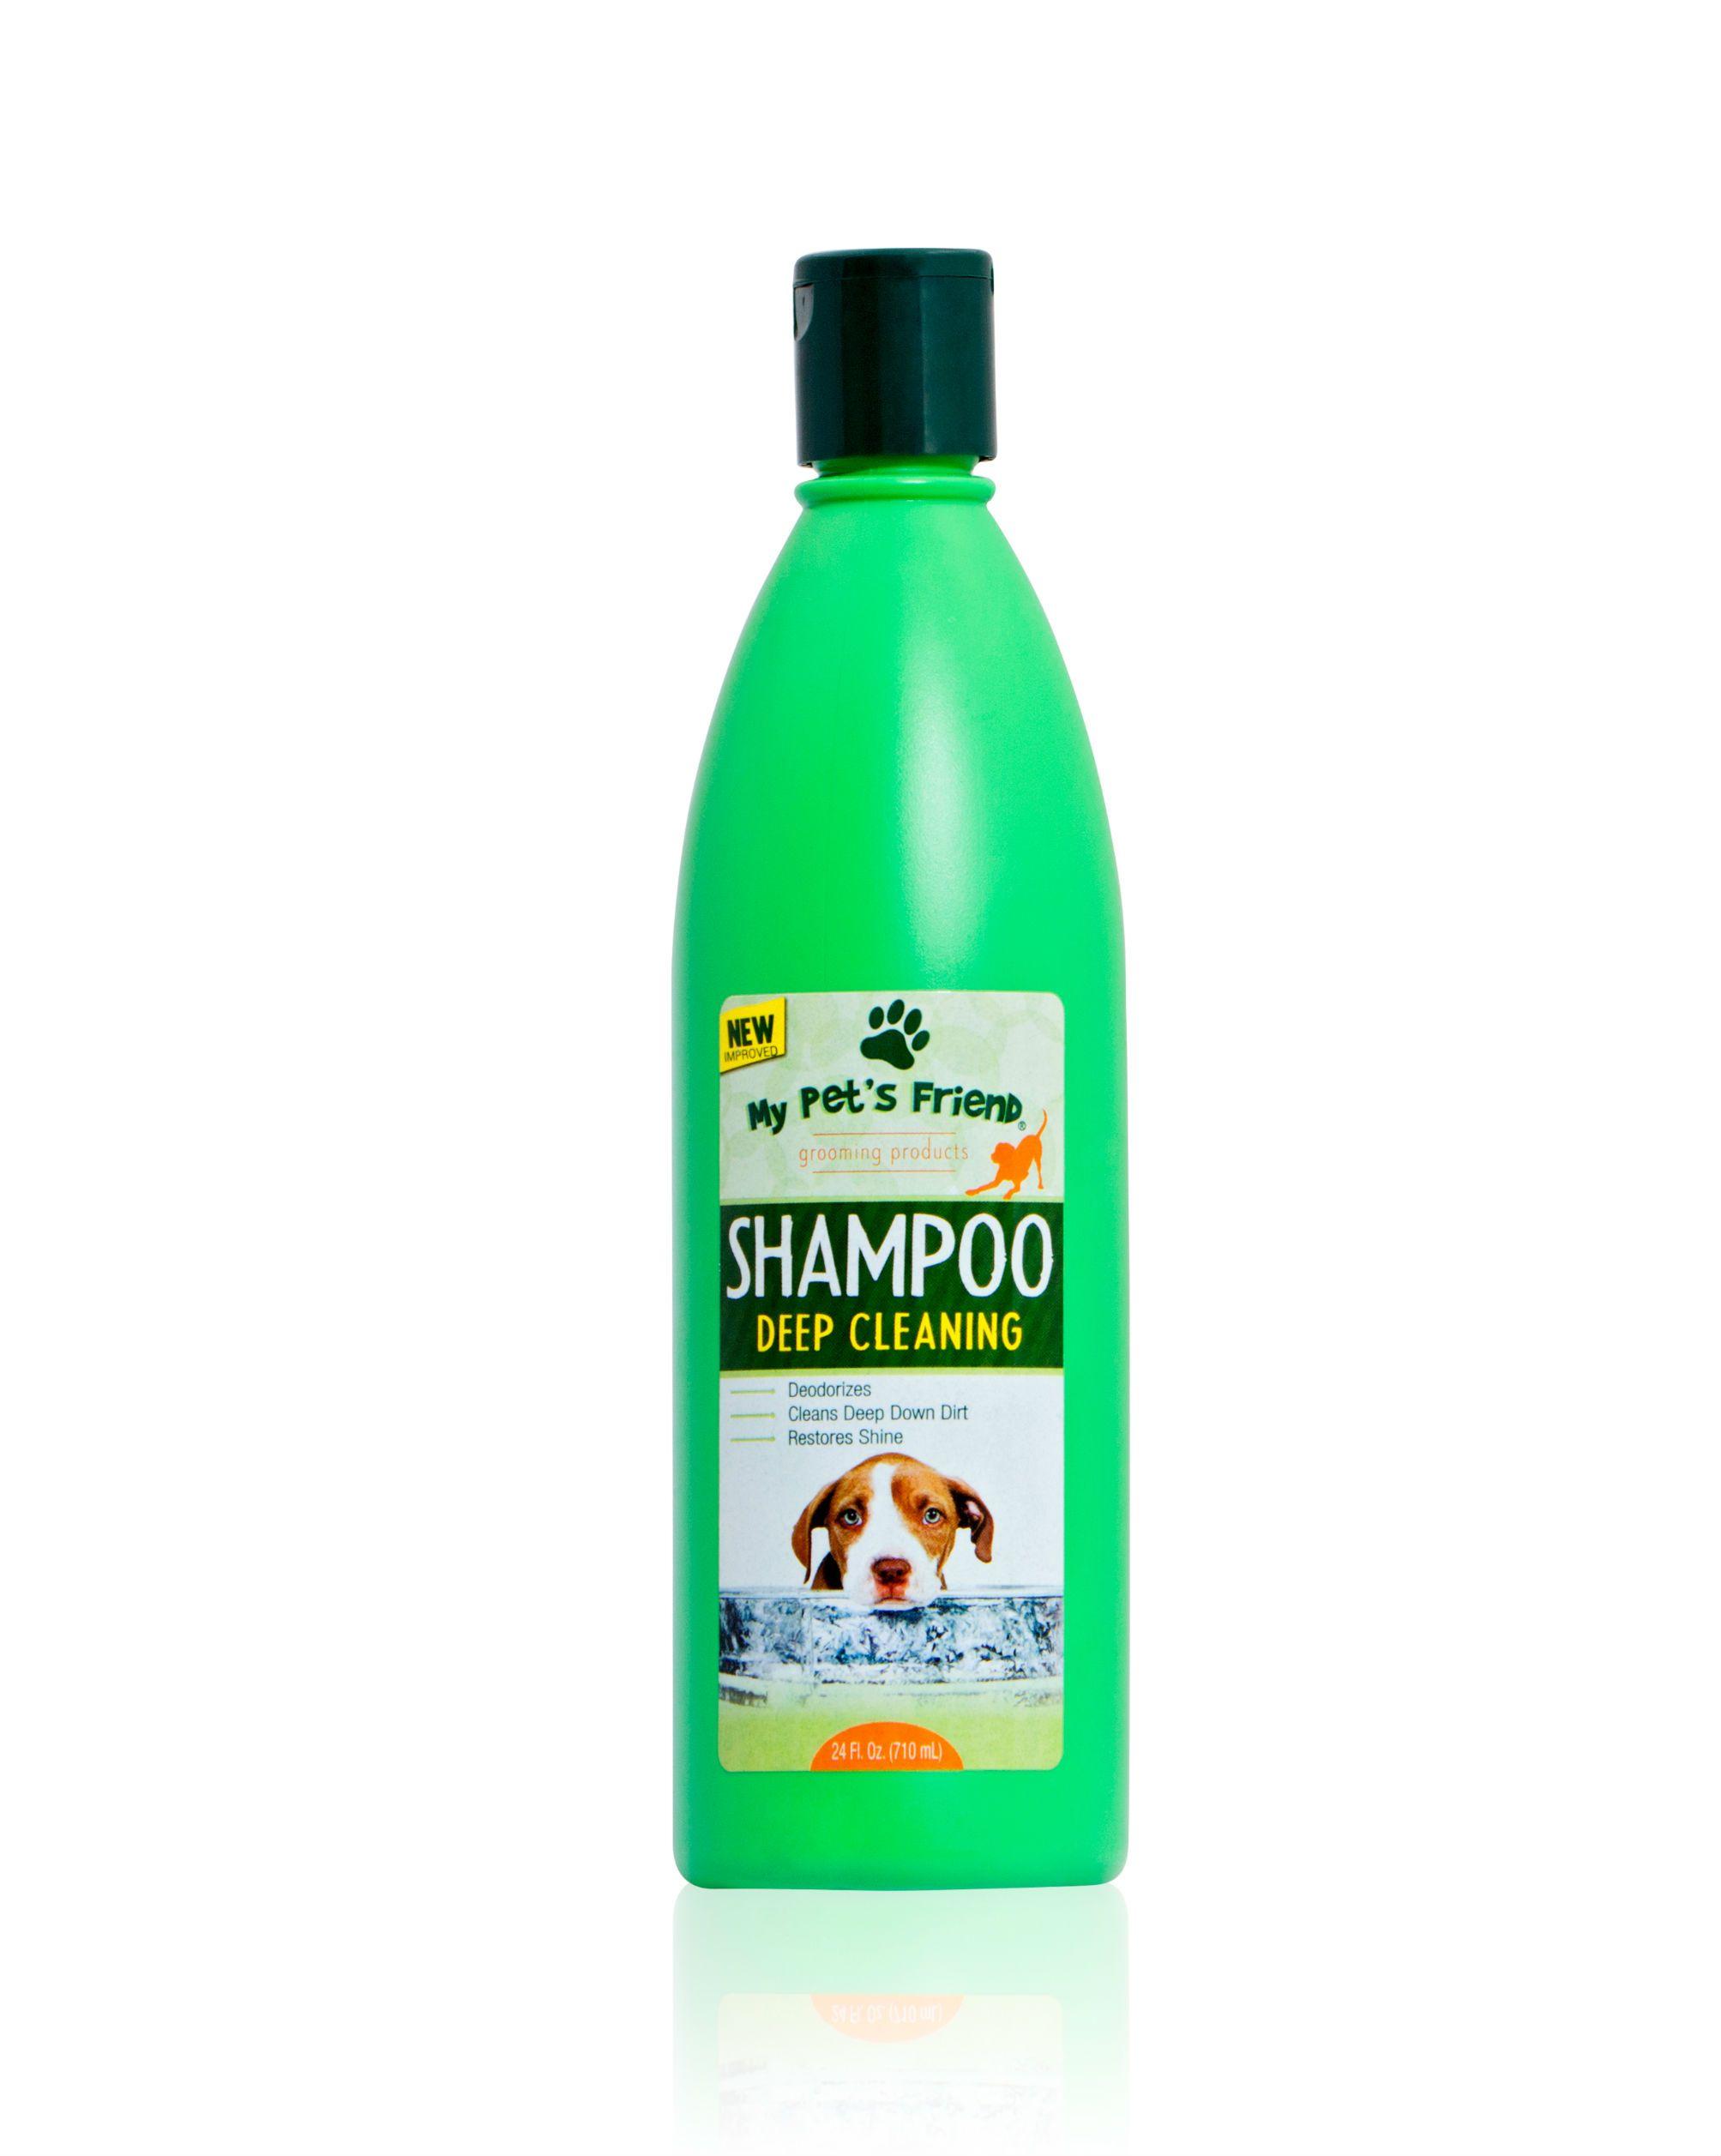 My Pets Friend Dog Shampoo 16 Oz La S Totally Awesome Dog Shampoo Pet Shampoo Pets